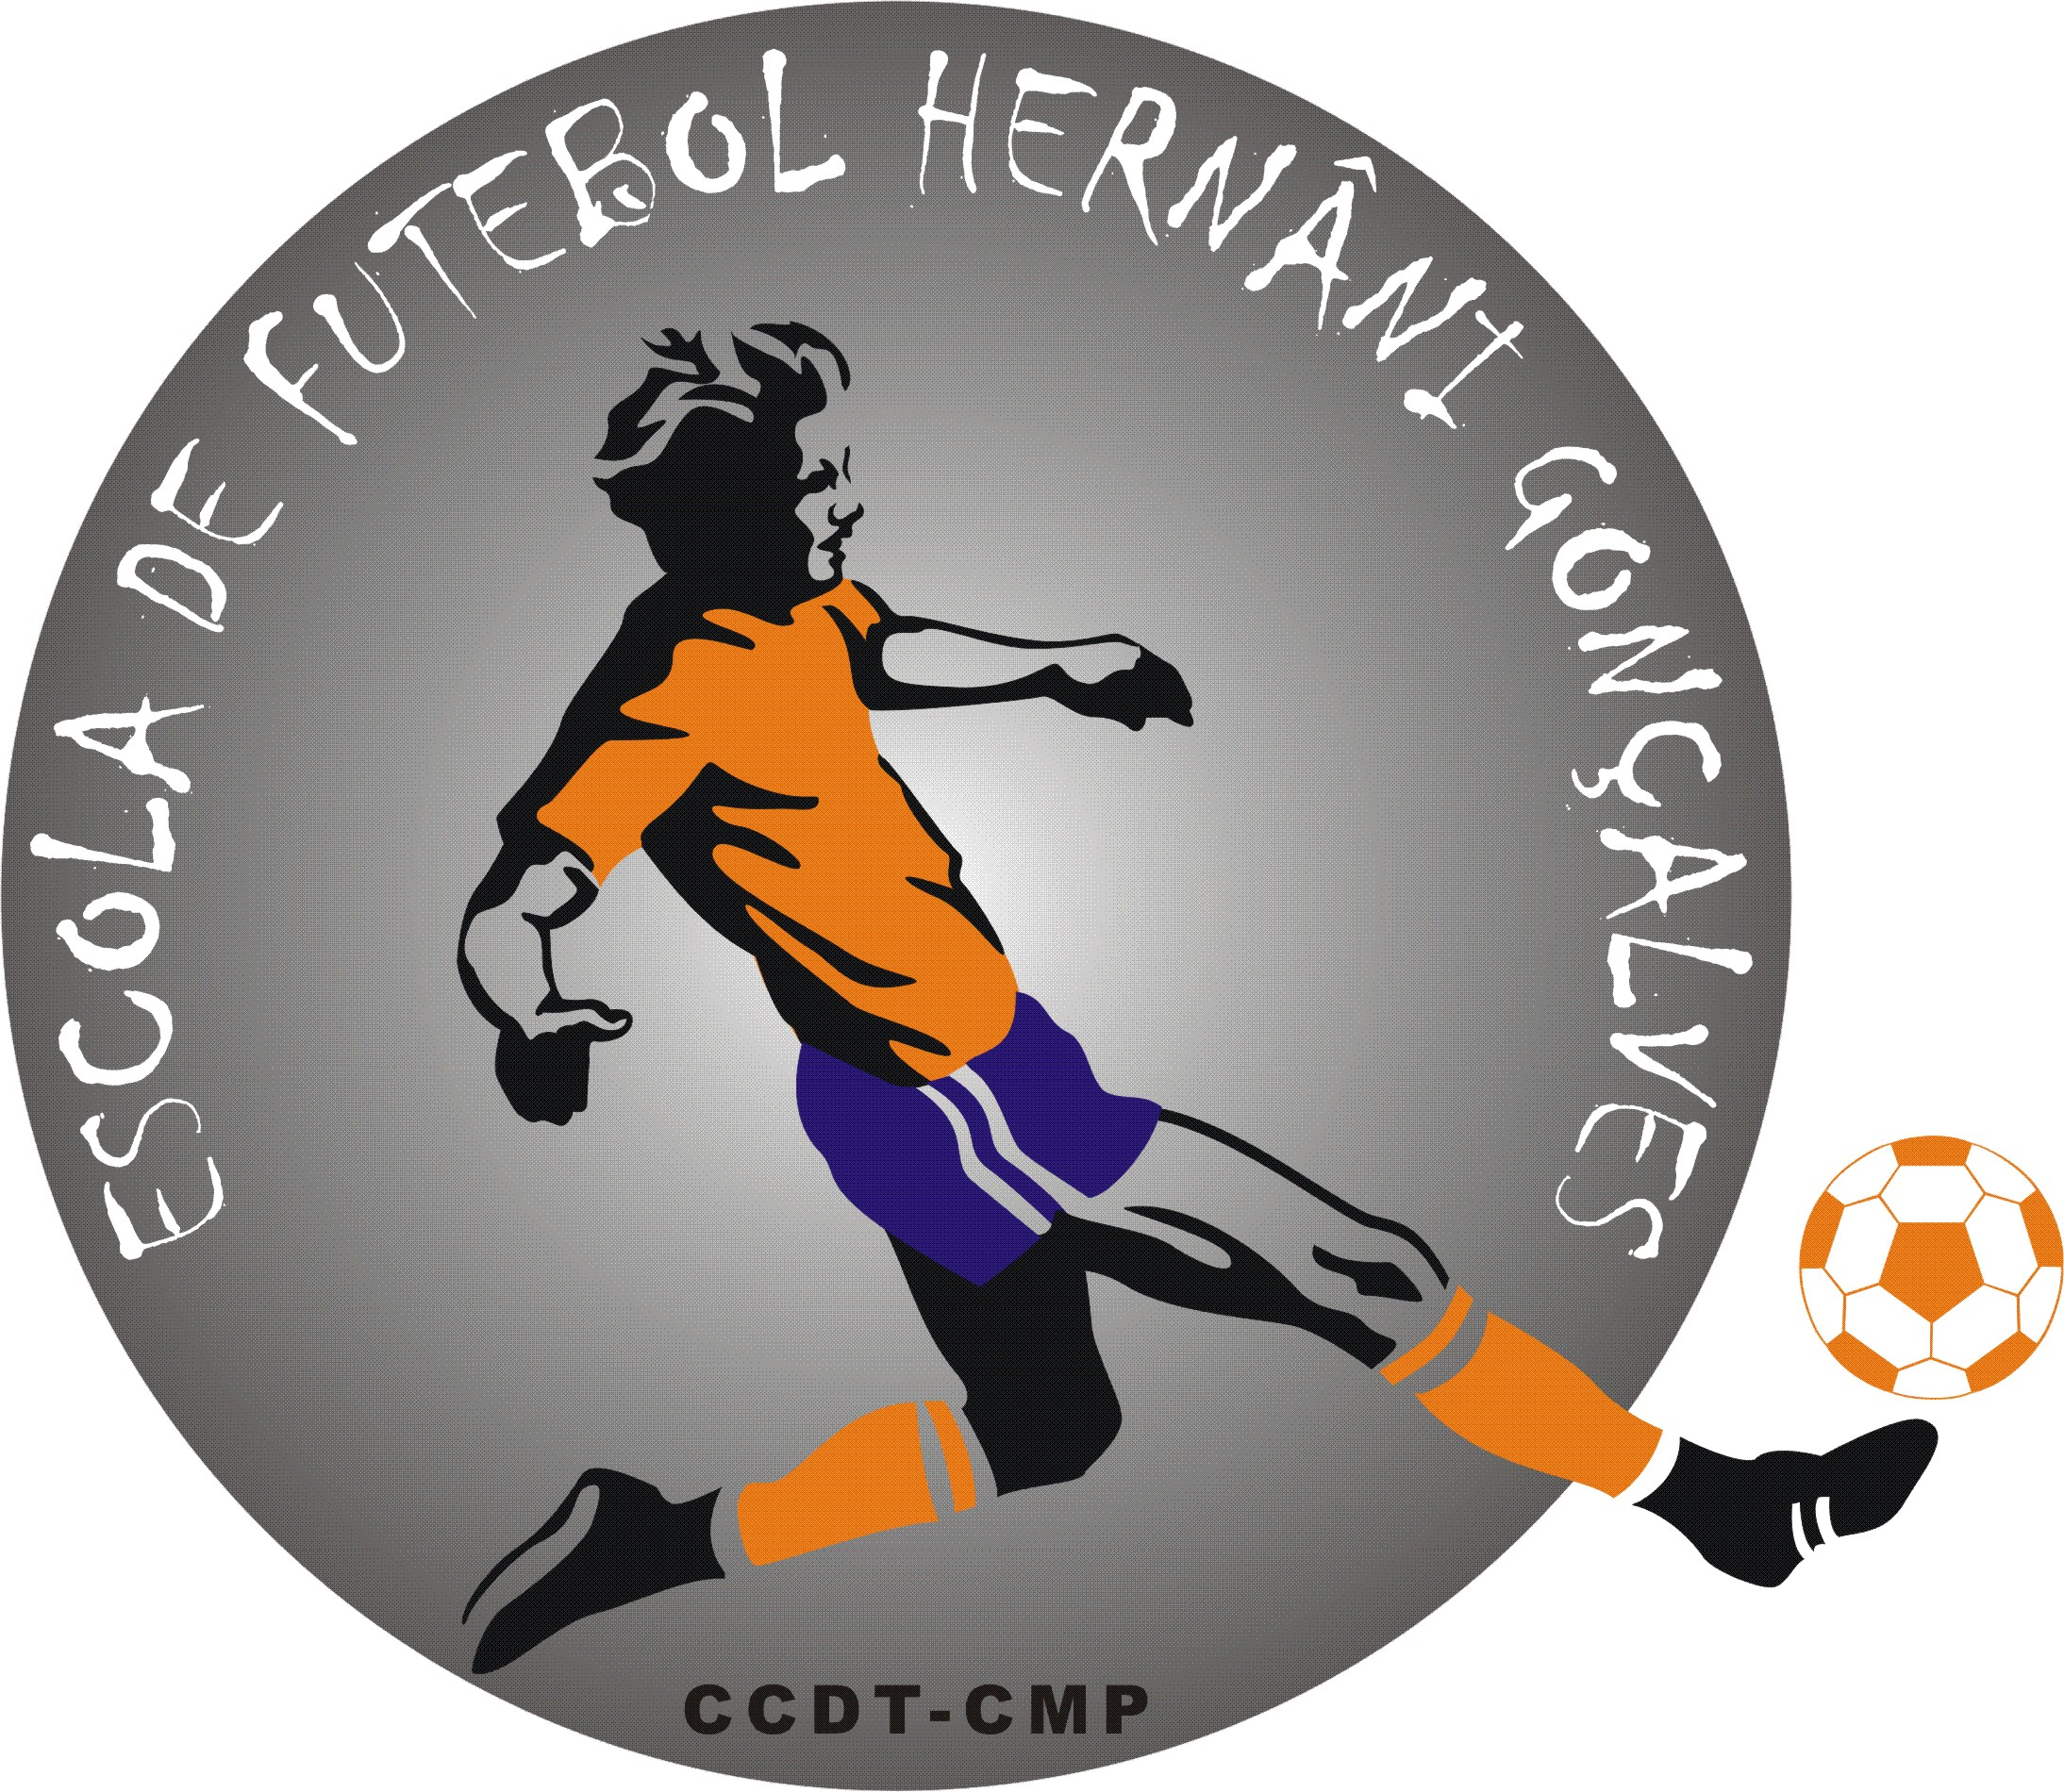 Assoc. Juv. Escola de Futebol Hernâni Gonçalves